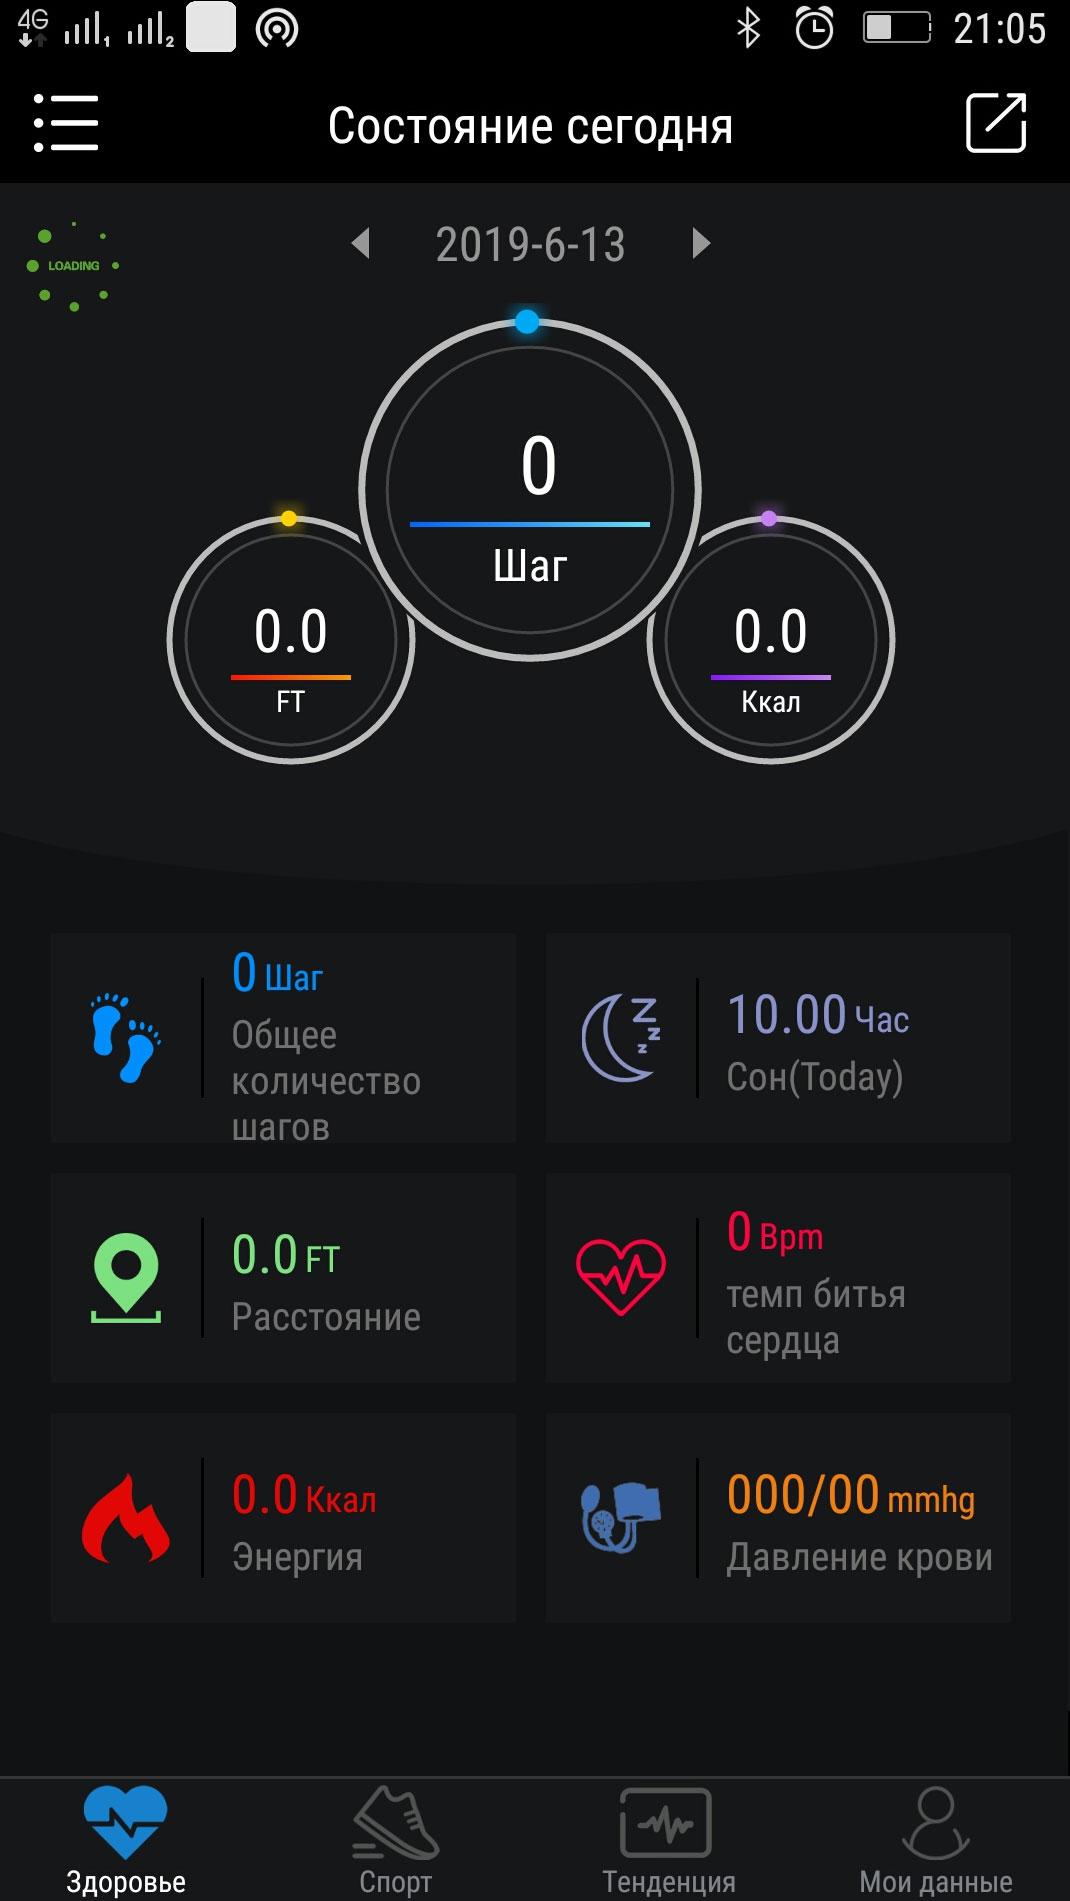 Обзор фитнес-браслета Smarterra FitMaster 4